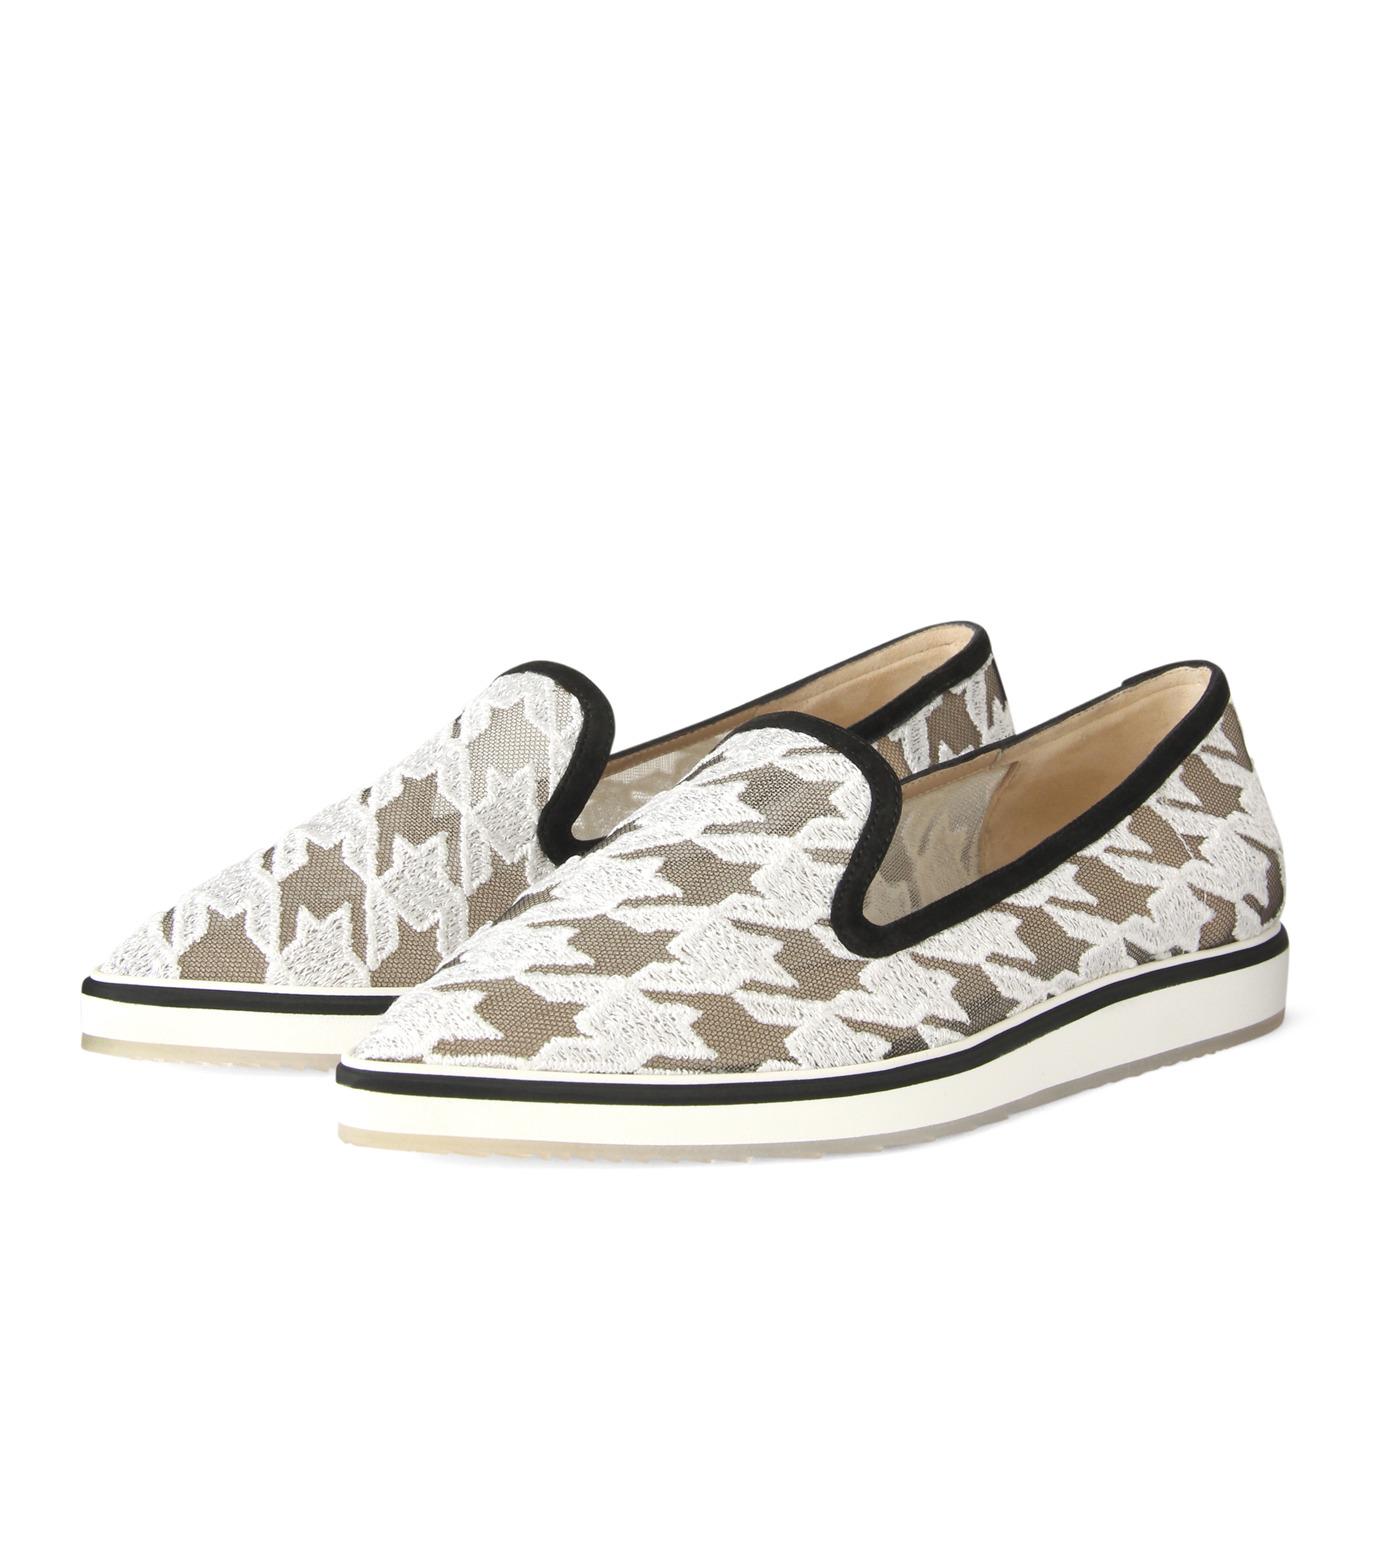 Nicholas  Kirkwood(ニコラス カークウッド)の35mm Alona Lace Loafer-WHITE(フラットシューズ/Flat shoes)-15A093-4 拡大詳細画像3